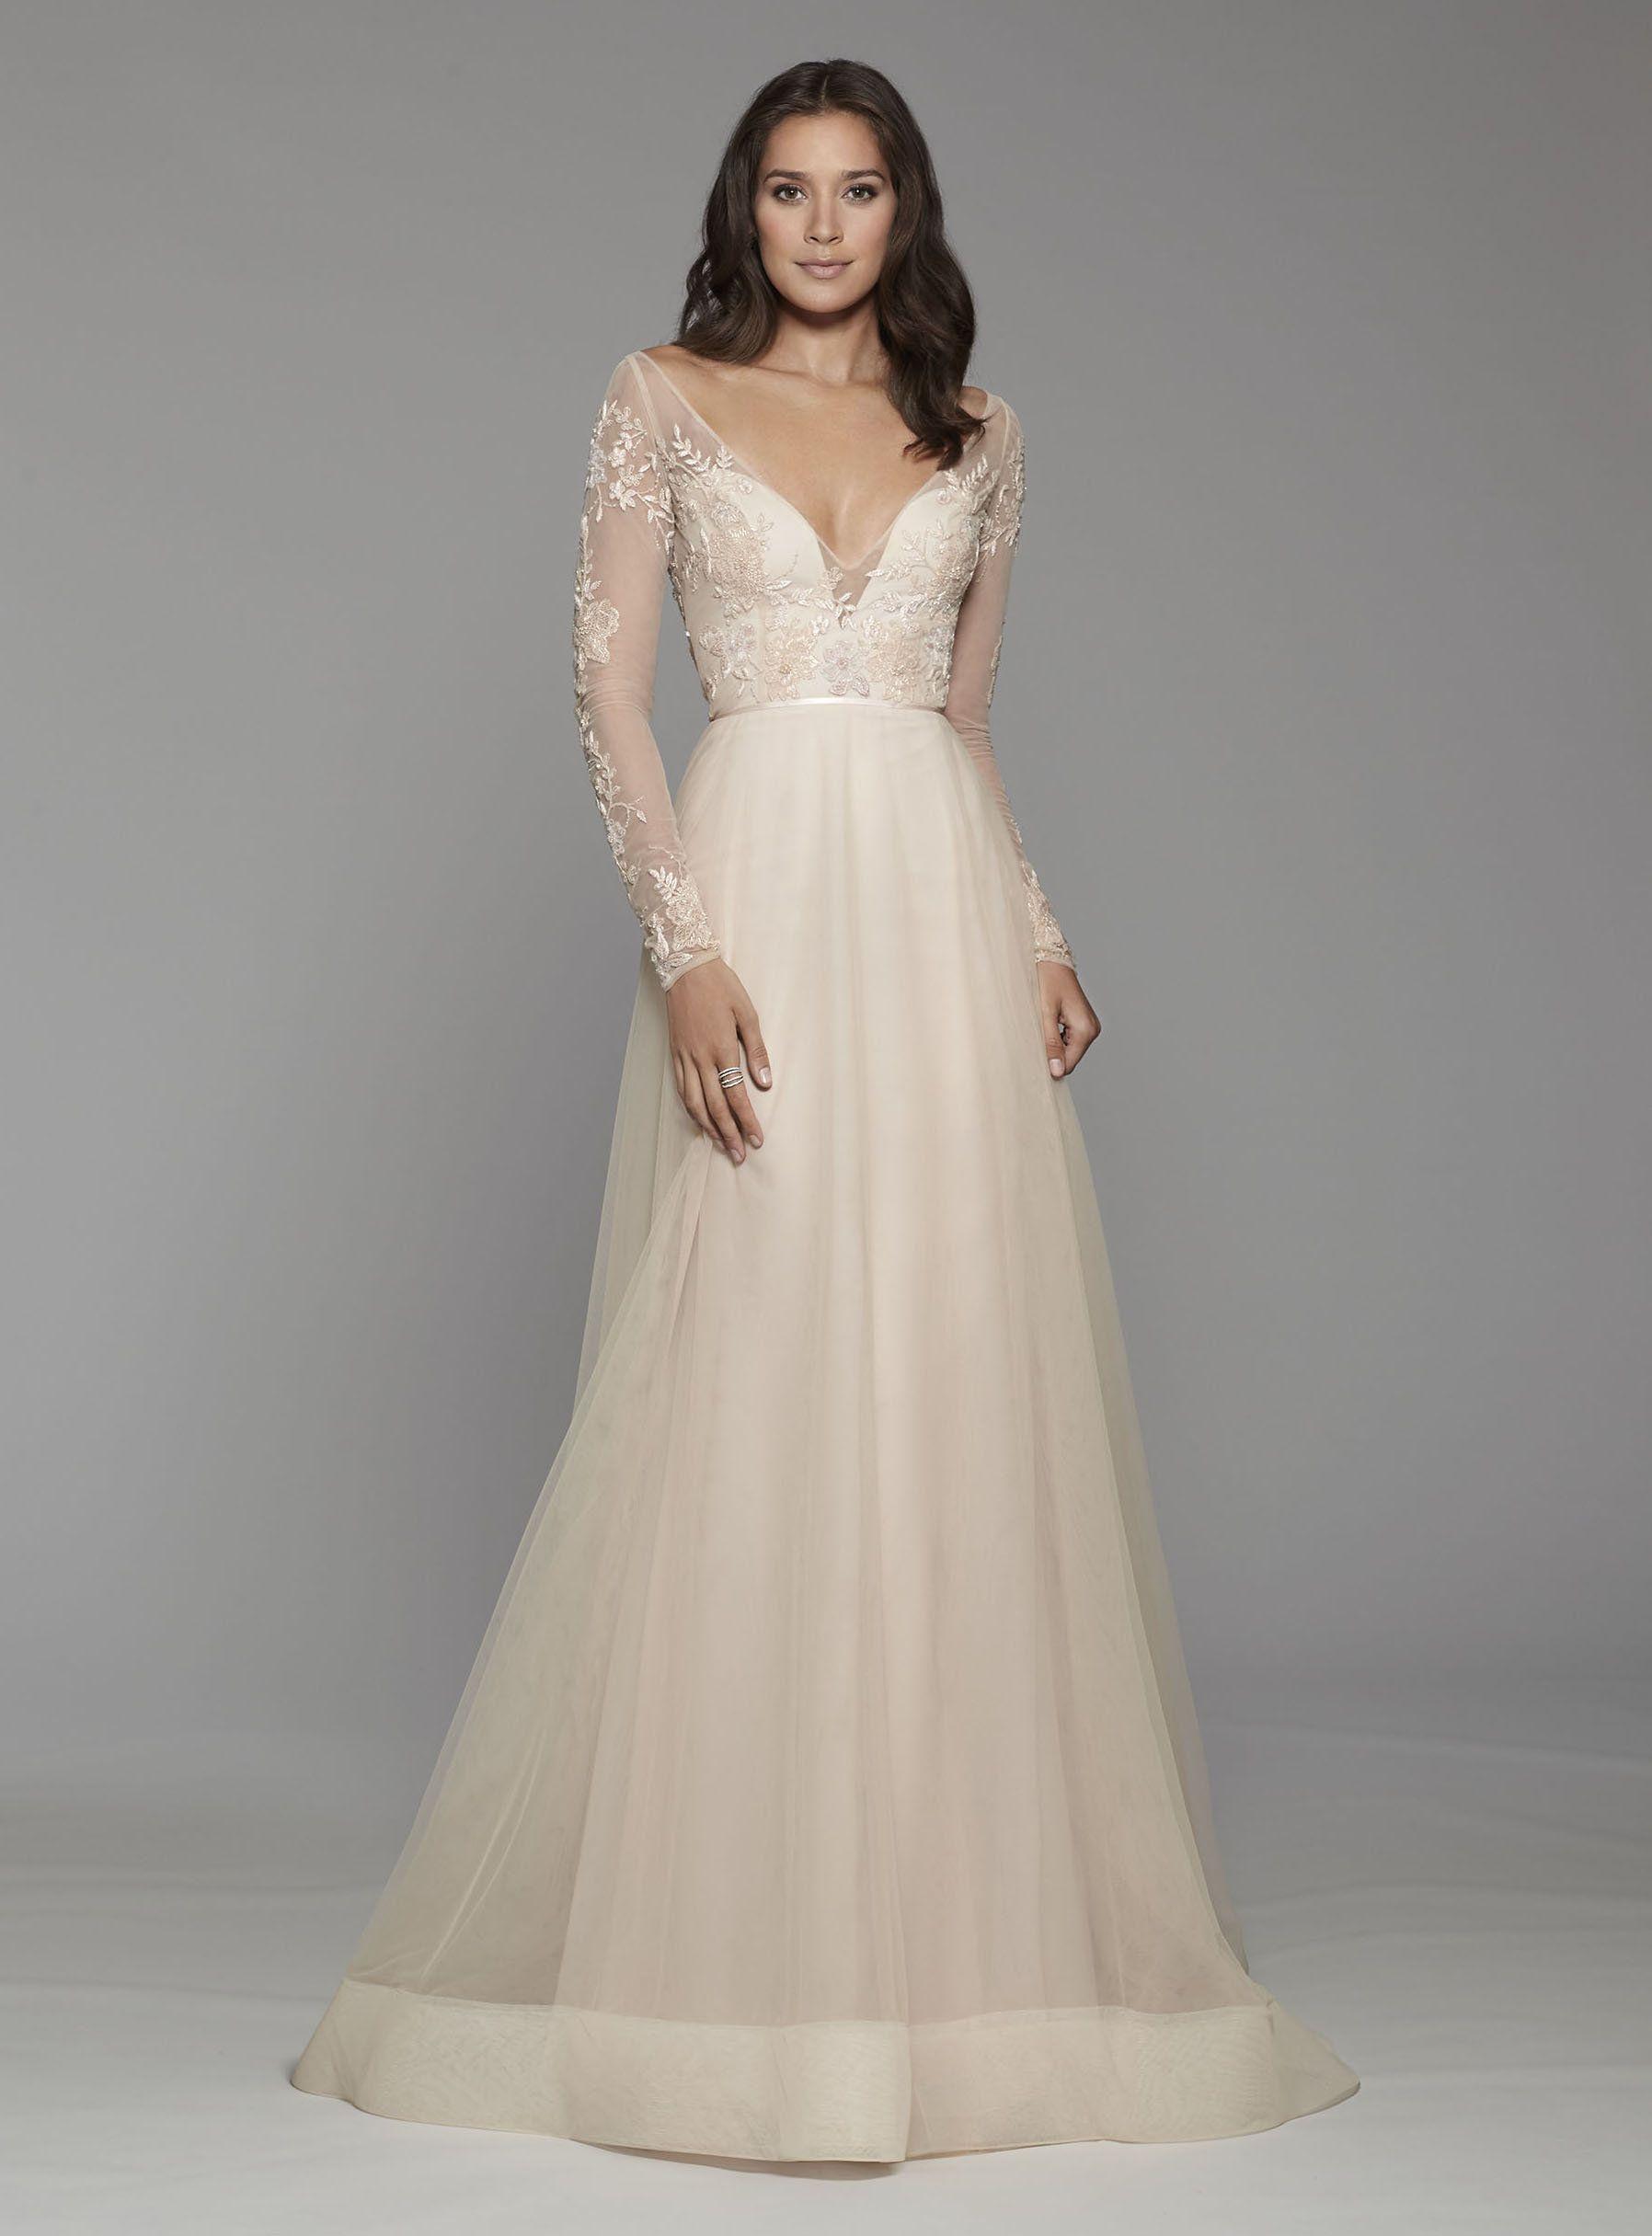 13 Bohemian A-line Wedding Dress  Ärmelhochzeitskleider